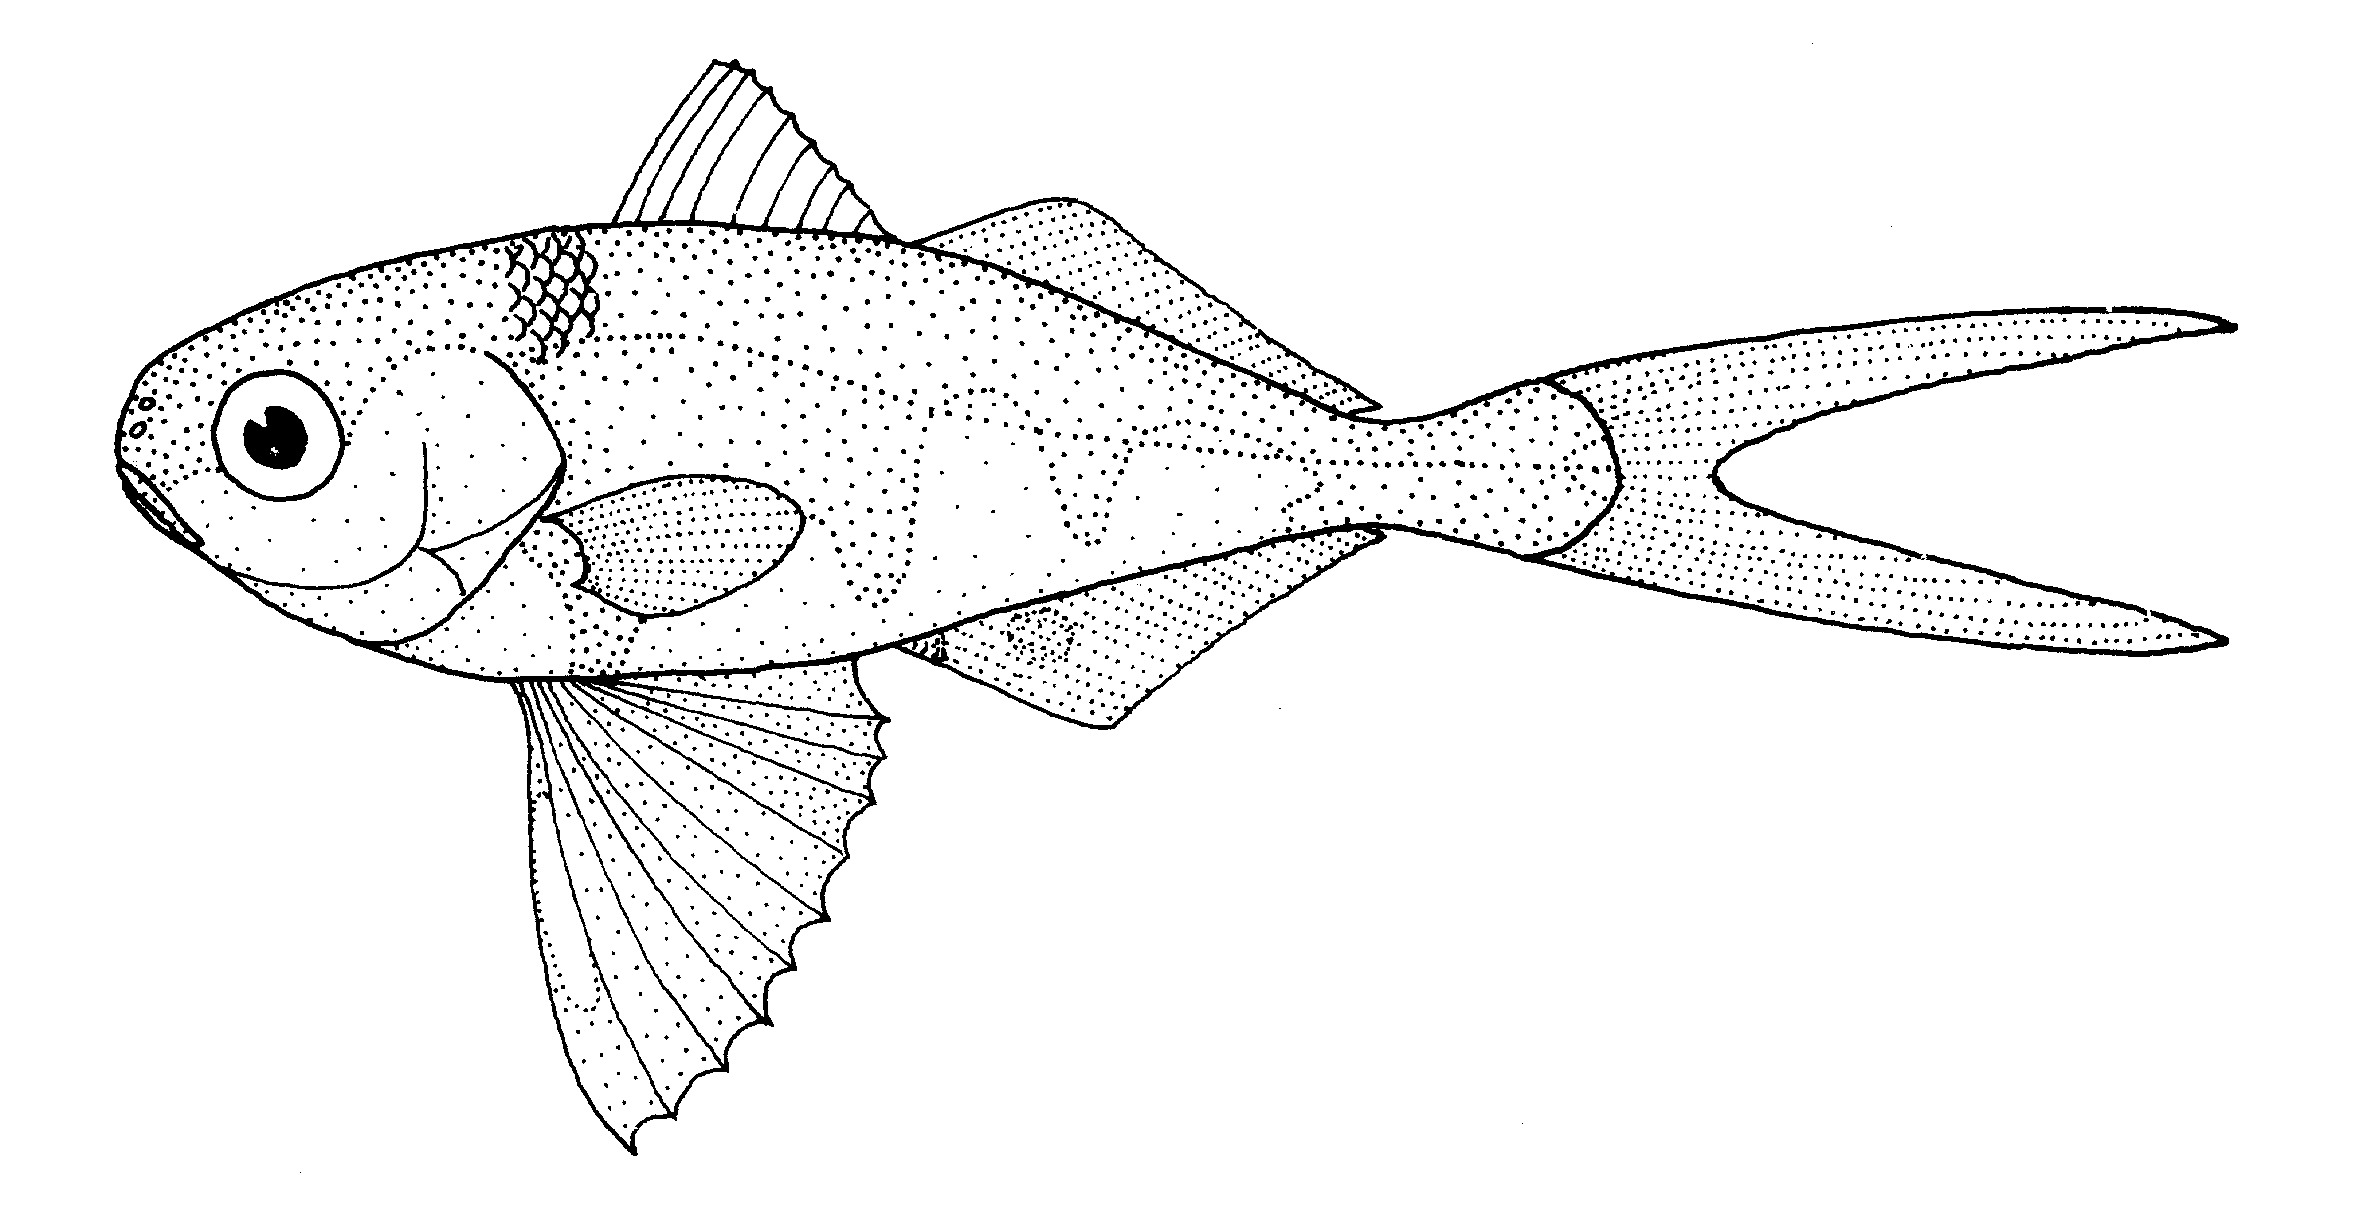 Image of Man-of-war Fish